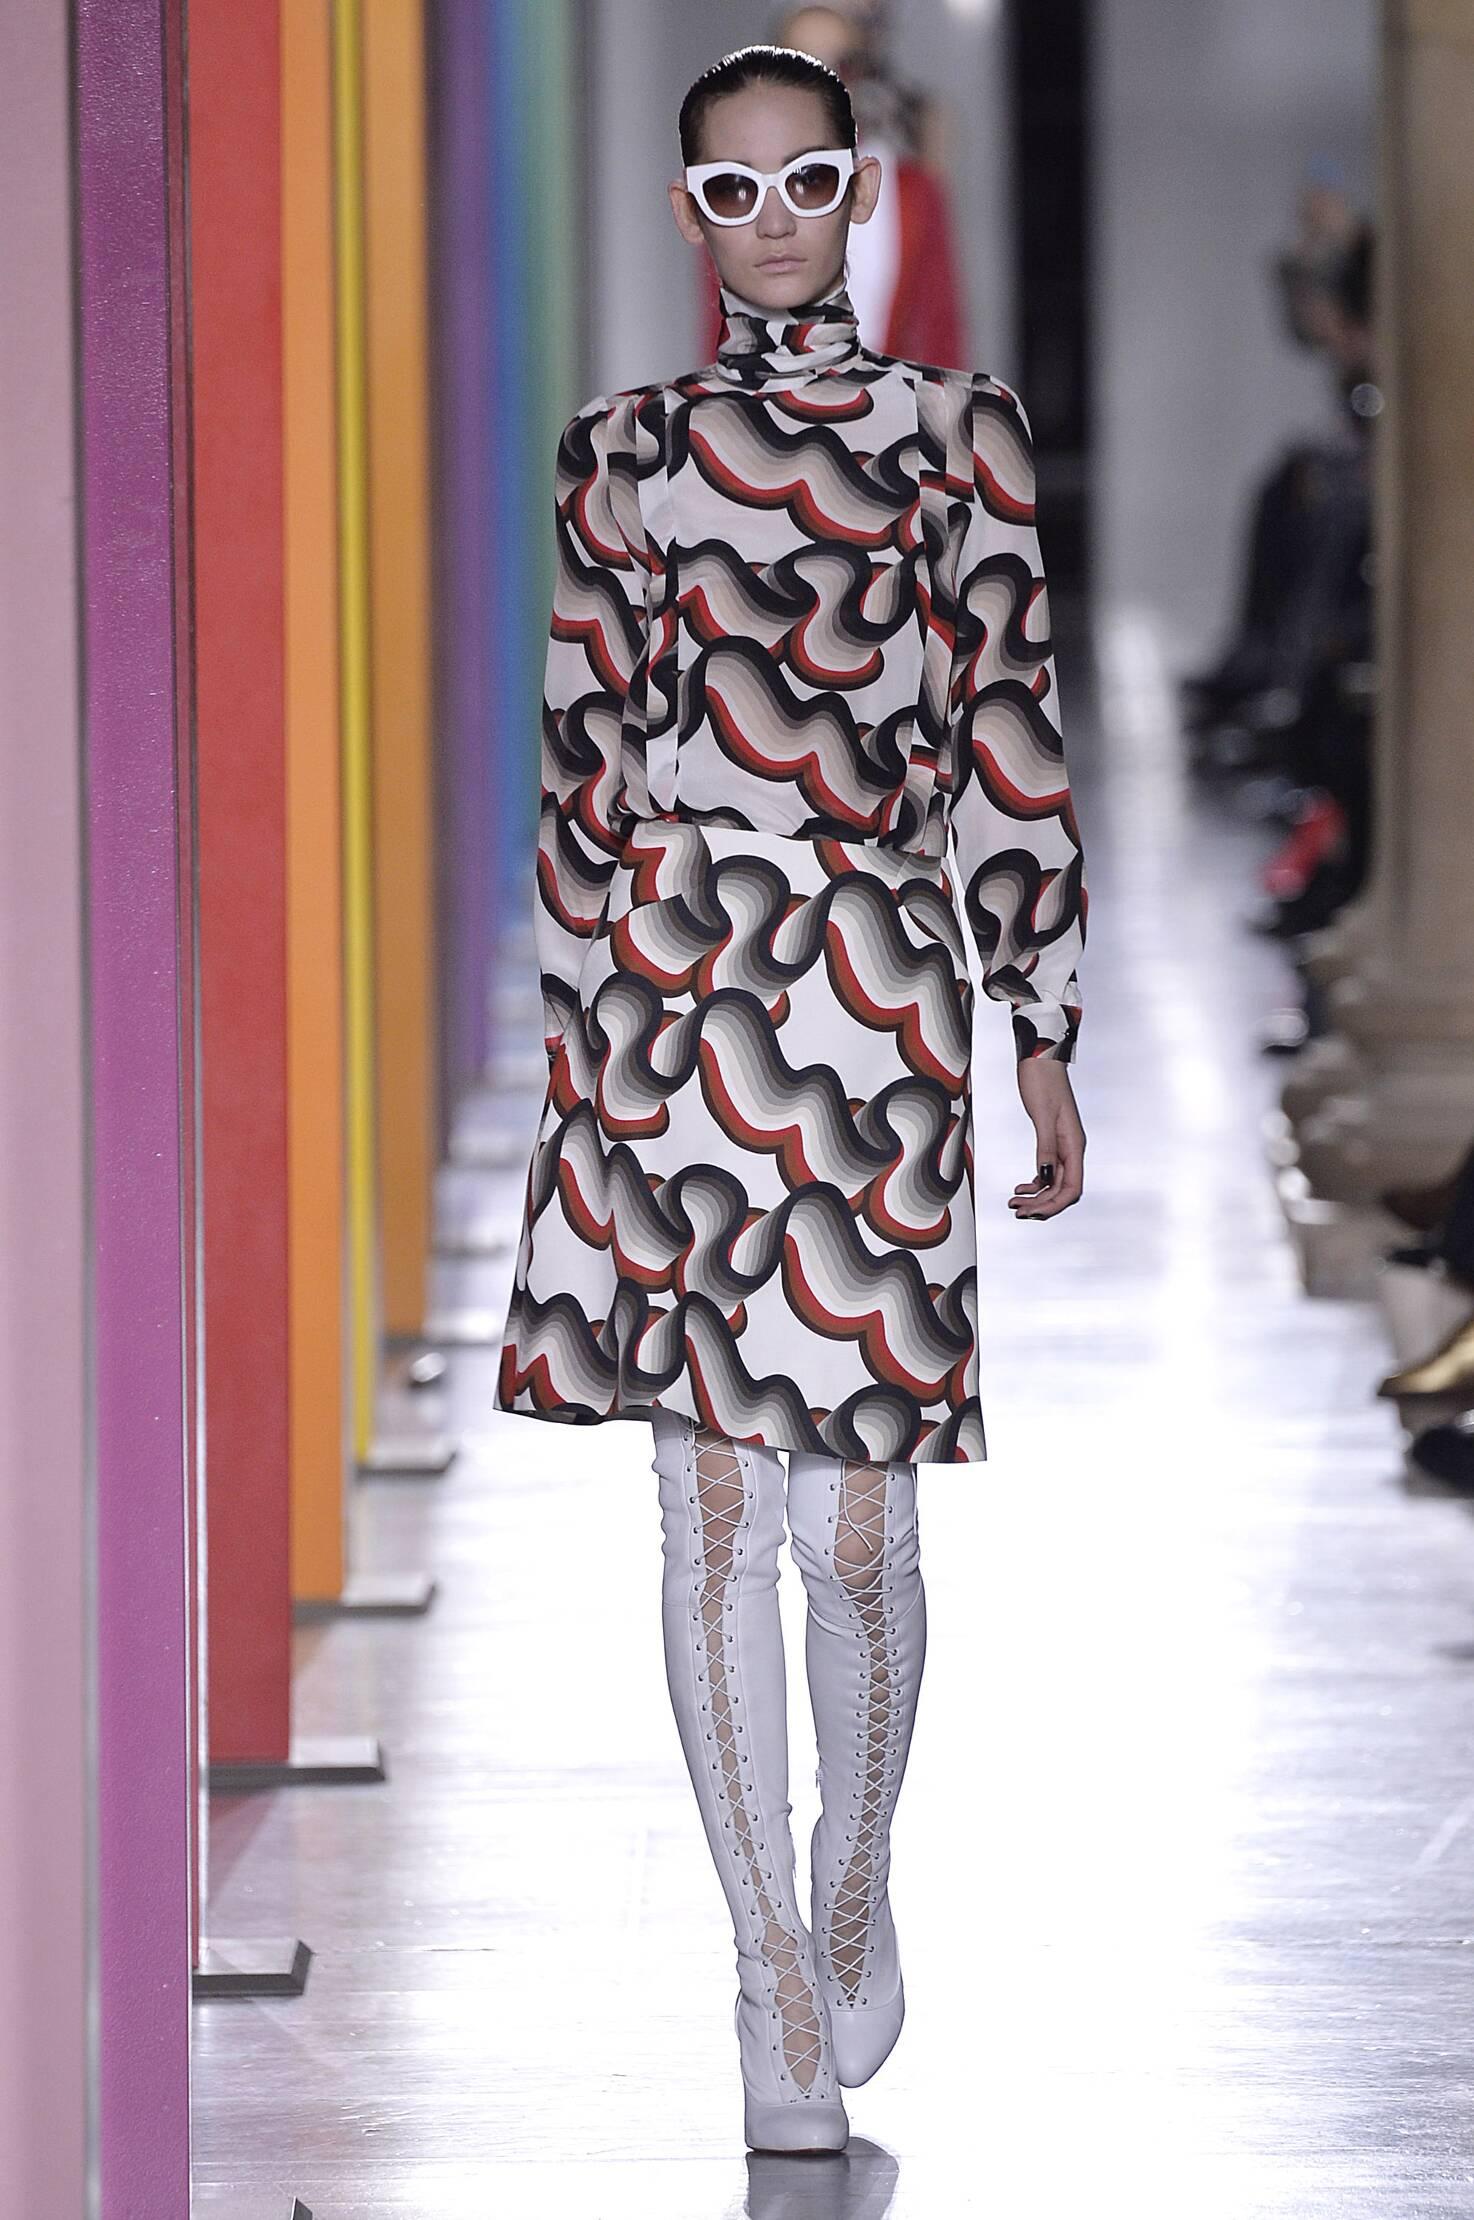 Jonathan Saunders Fall Winter 2015 16 Womenswear Collection London Fashion Week Fashion Show